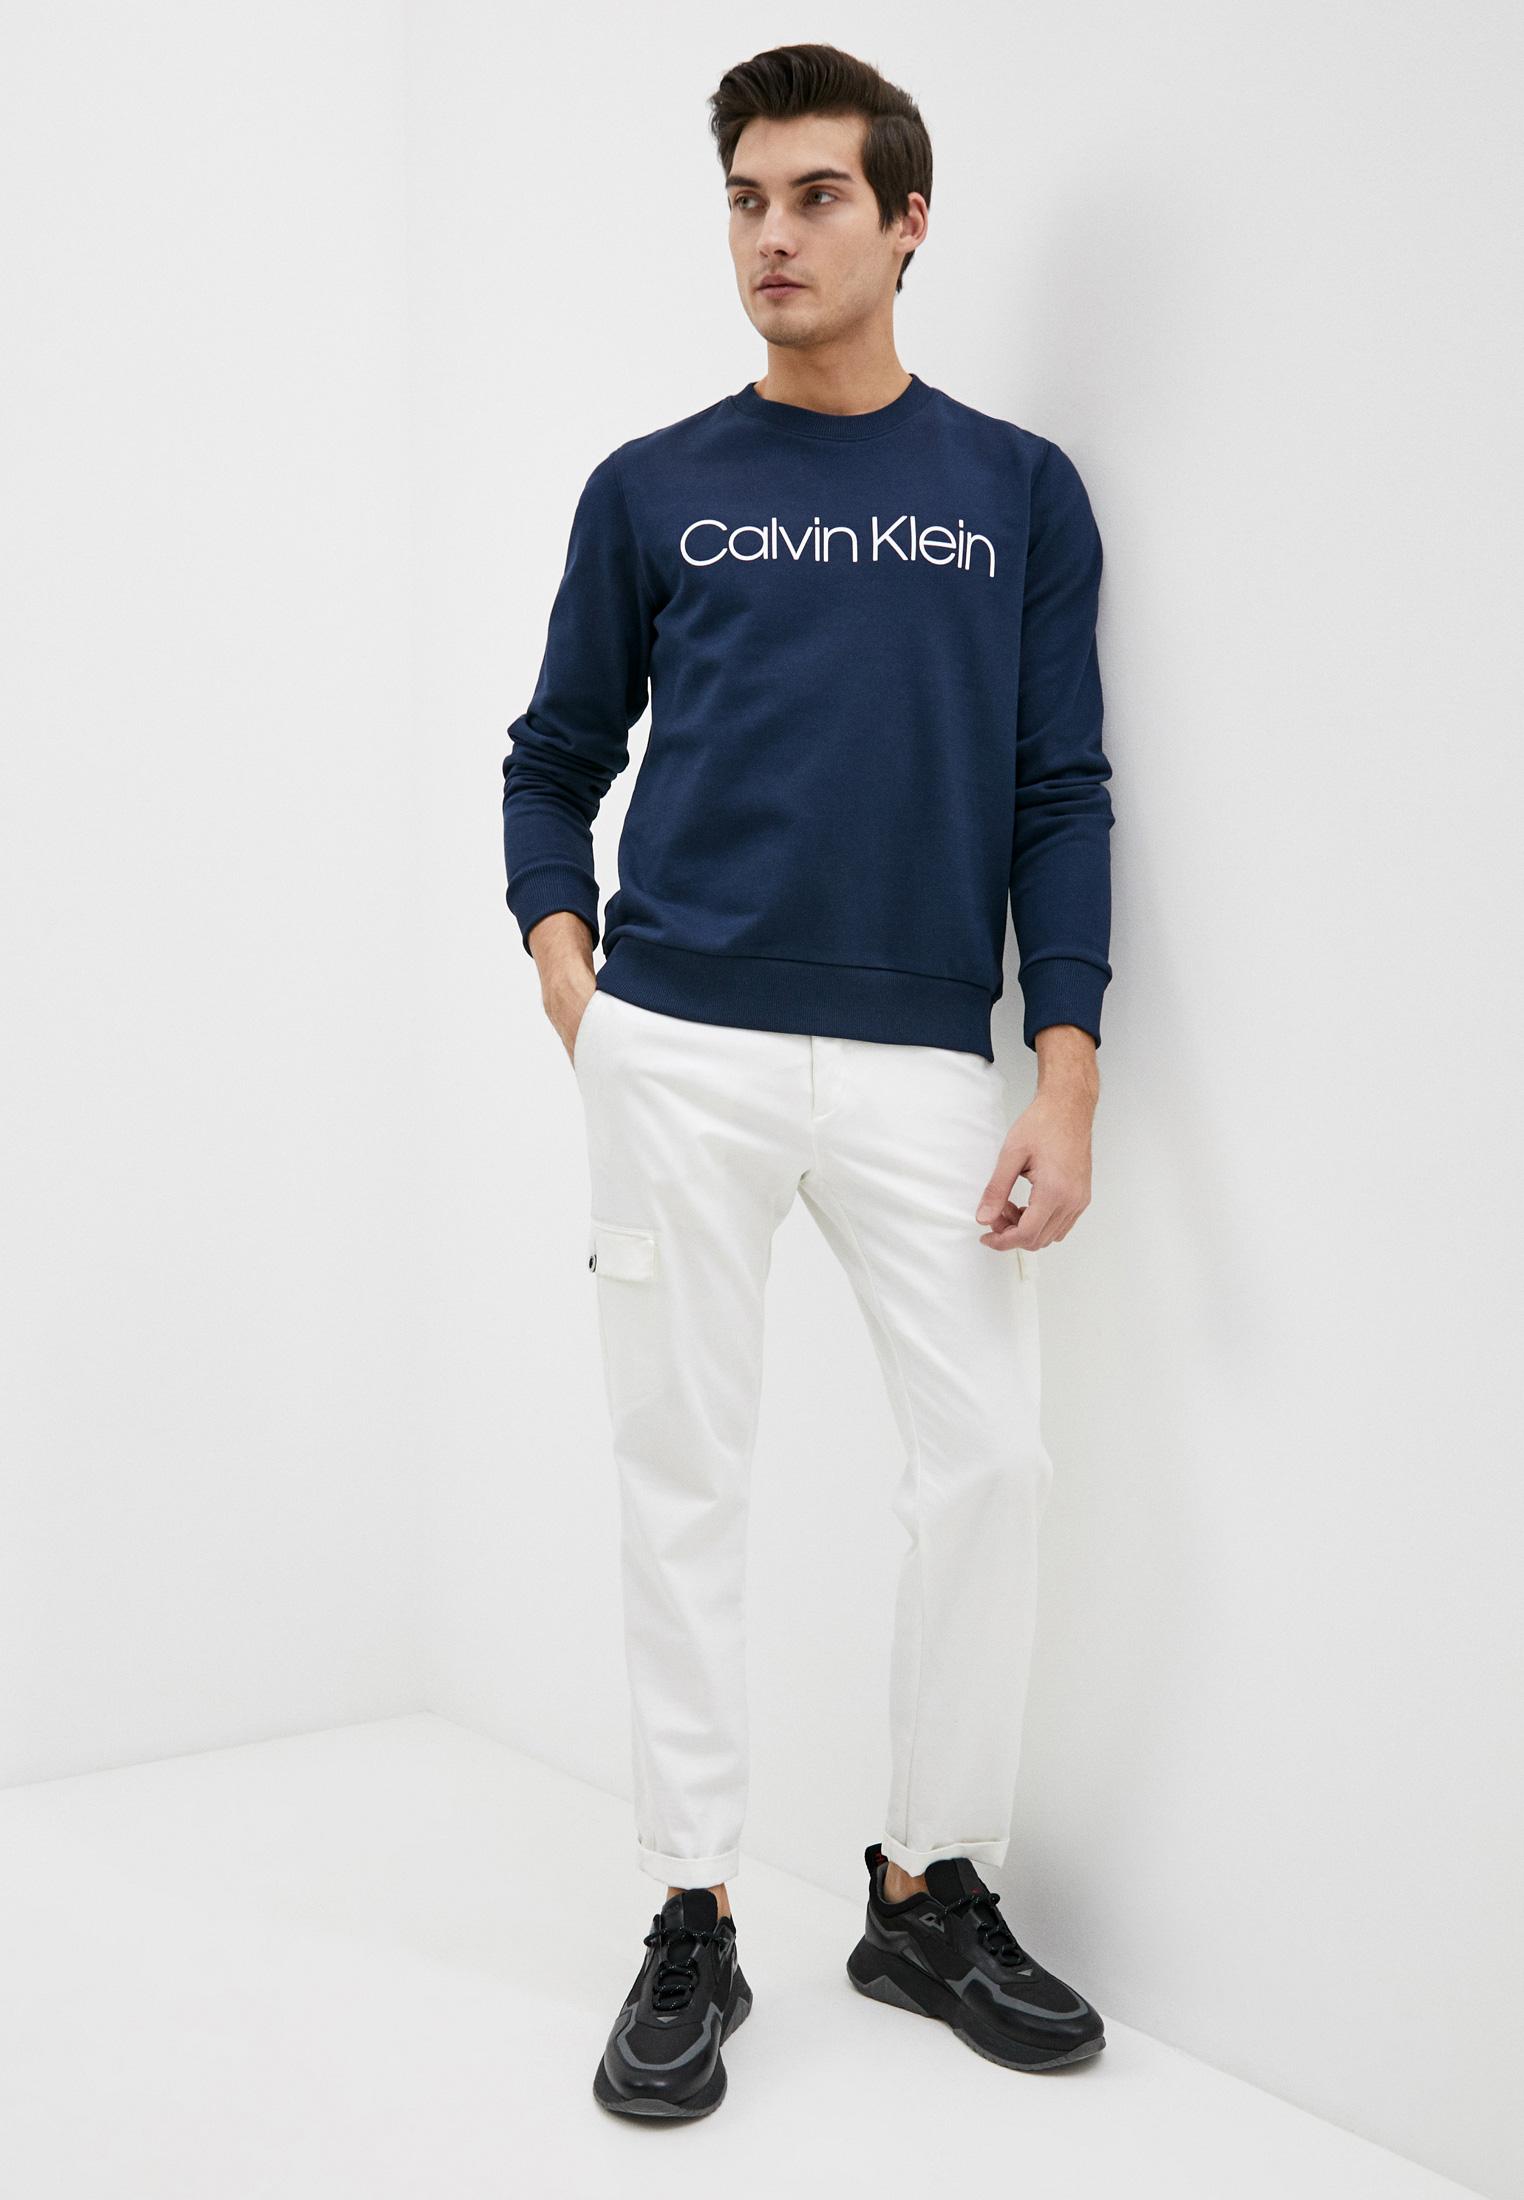 Свитер Calvin Klein (Кельвин Кляйн) k10k104059: изображение 2